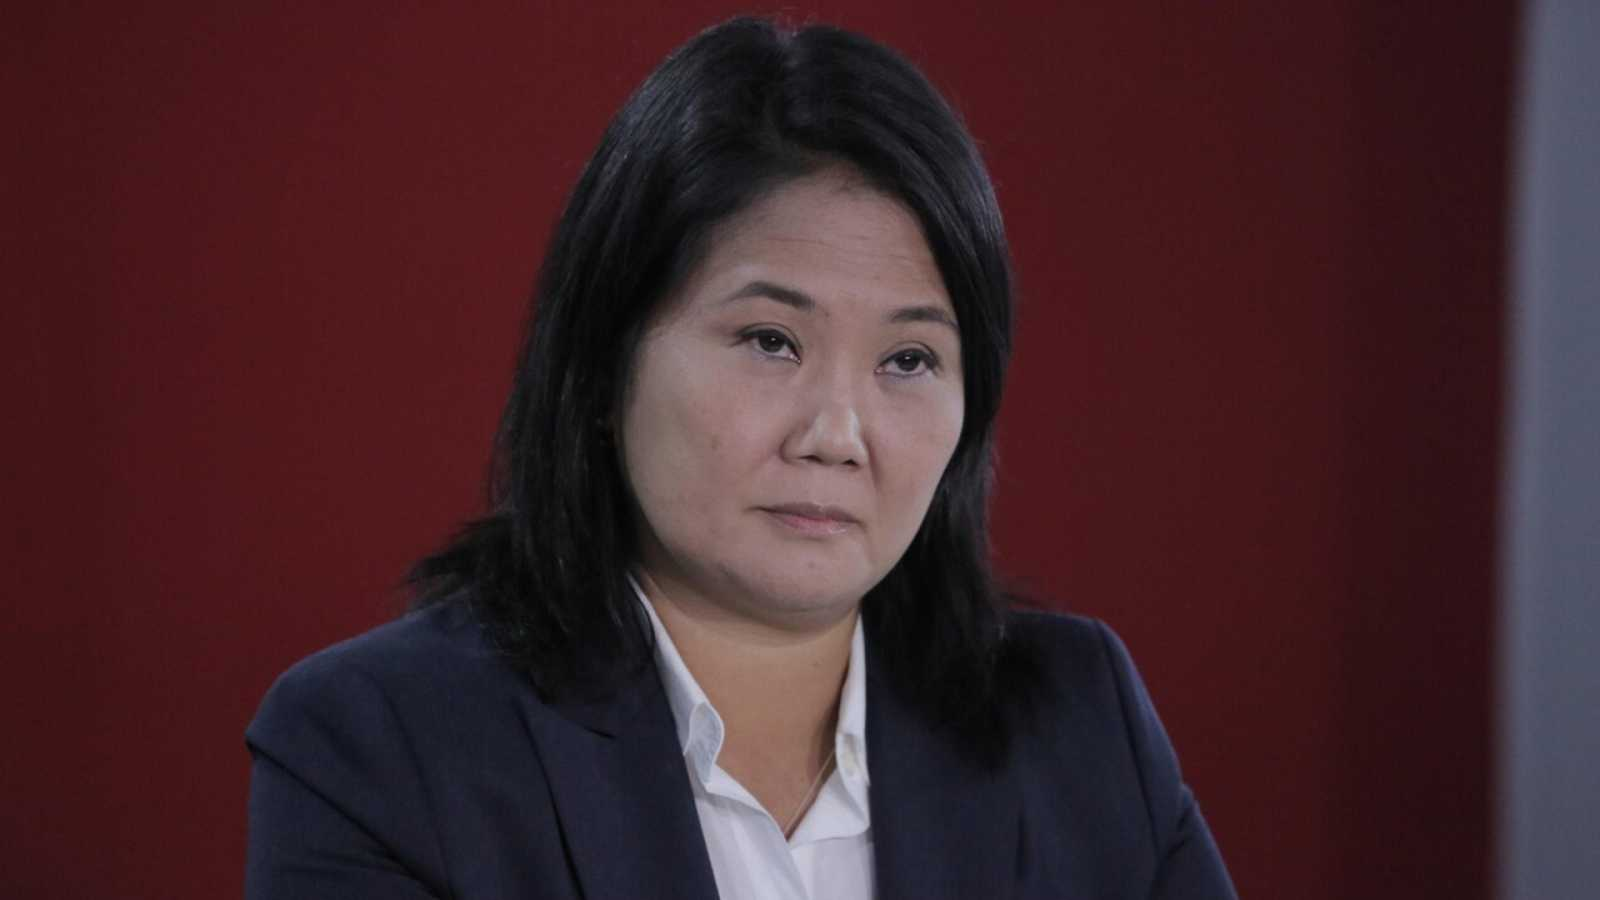 La candidata presidencial peruana Keiko Fujimori.  EFE/ John Reyes